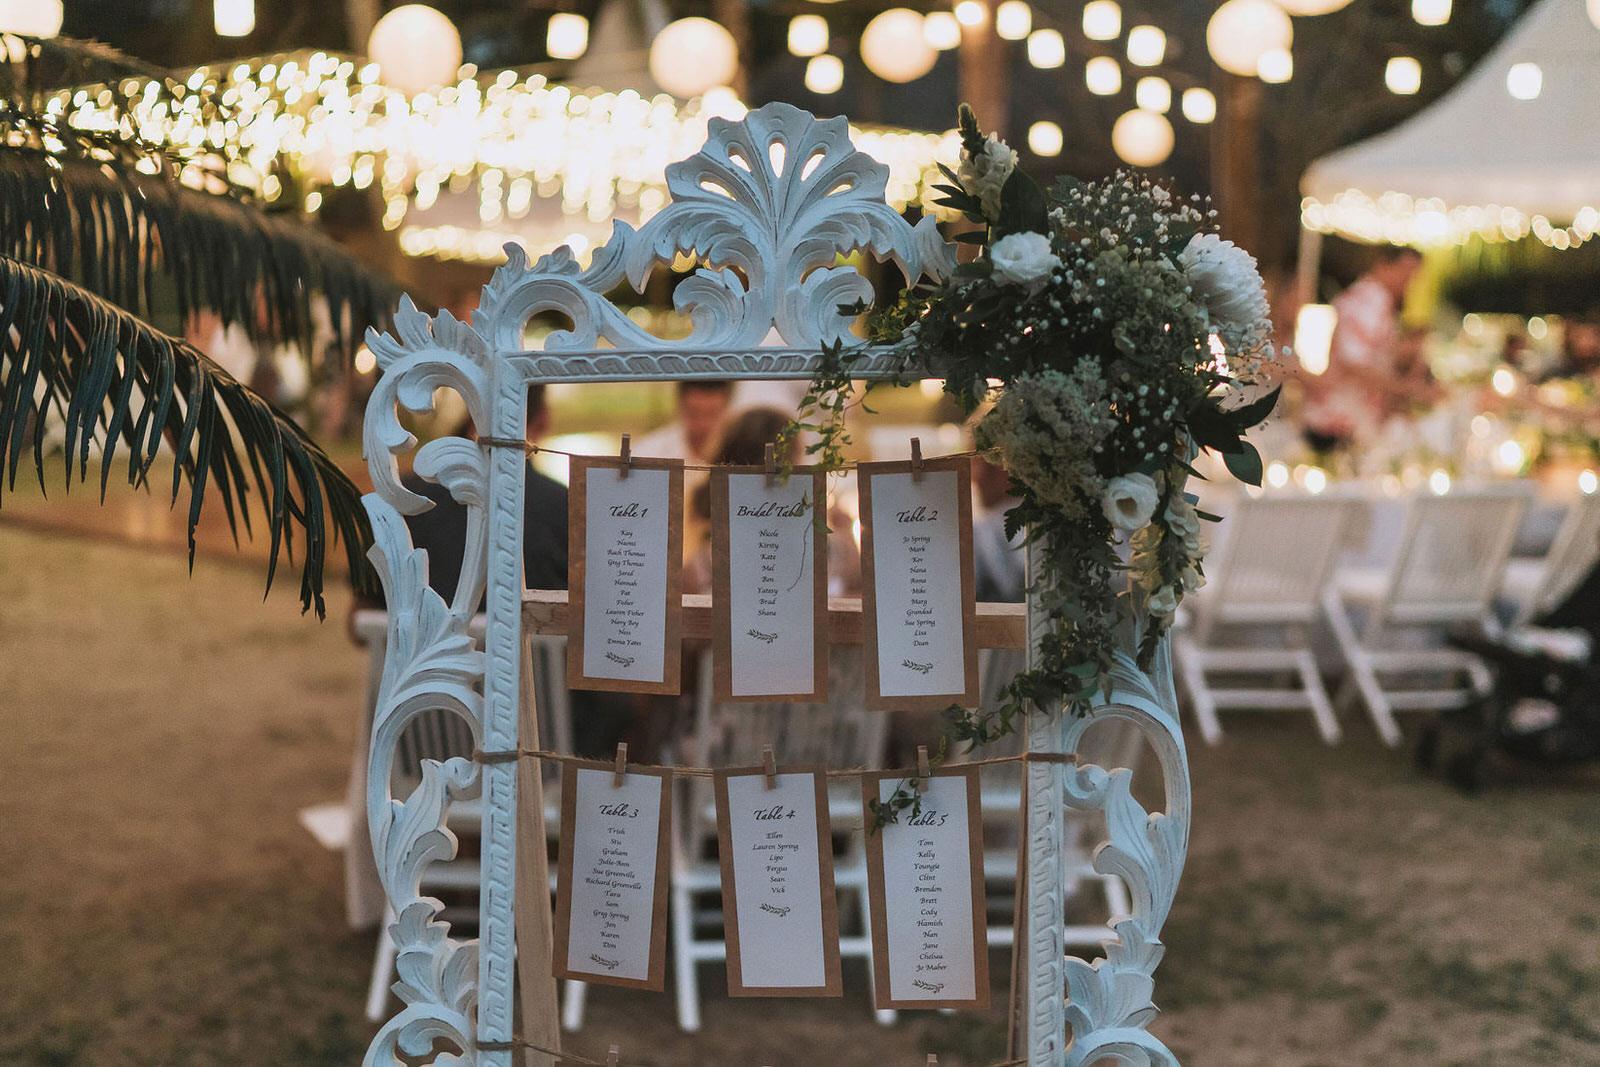 newfound-hai-tide-nusa-lembongan-bali-wedding-photographers-144